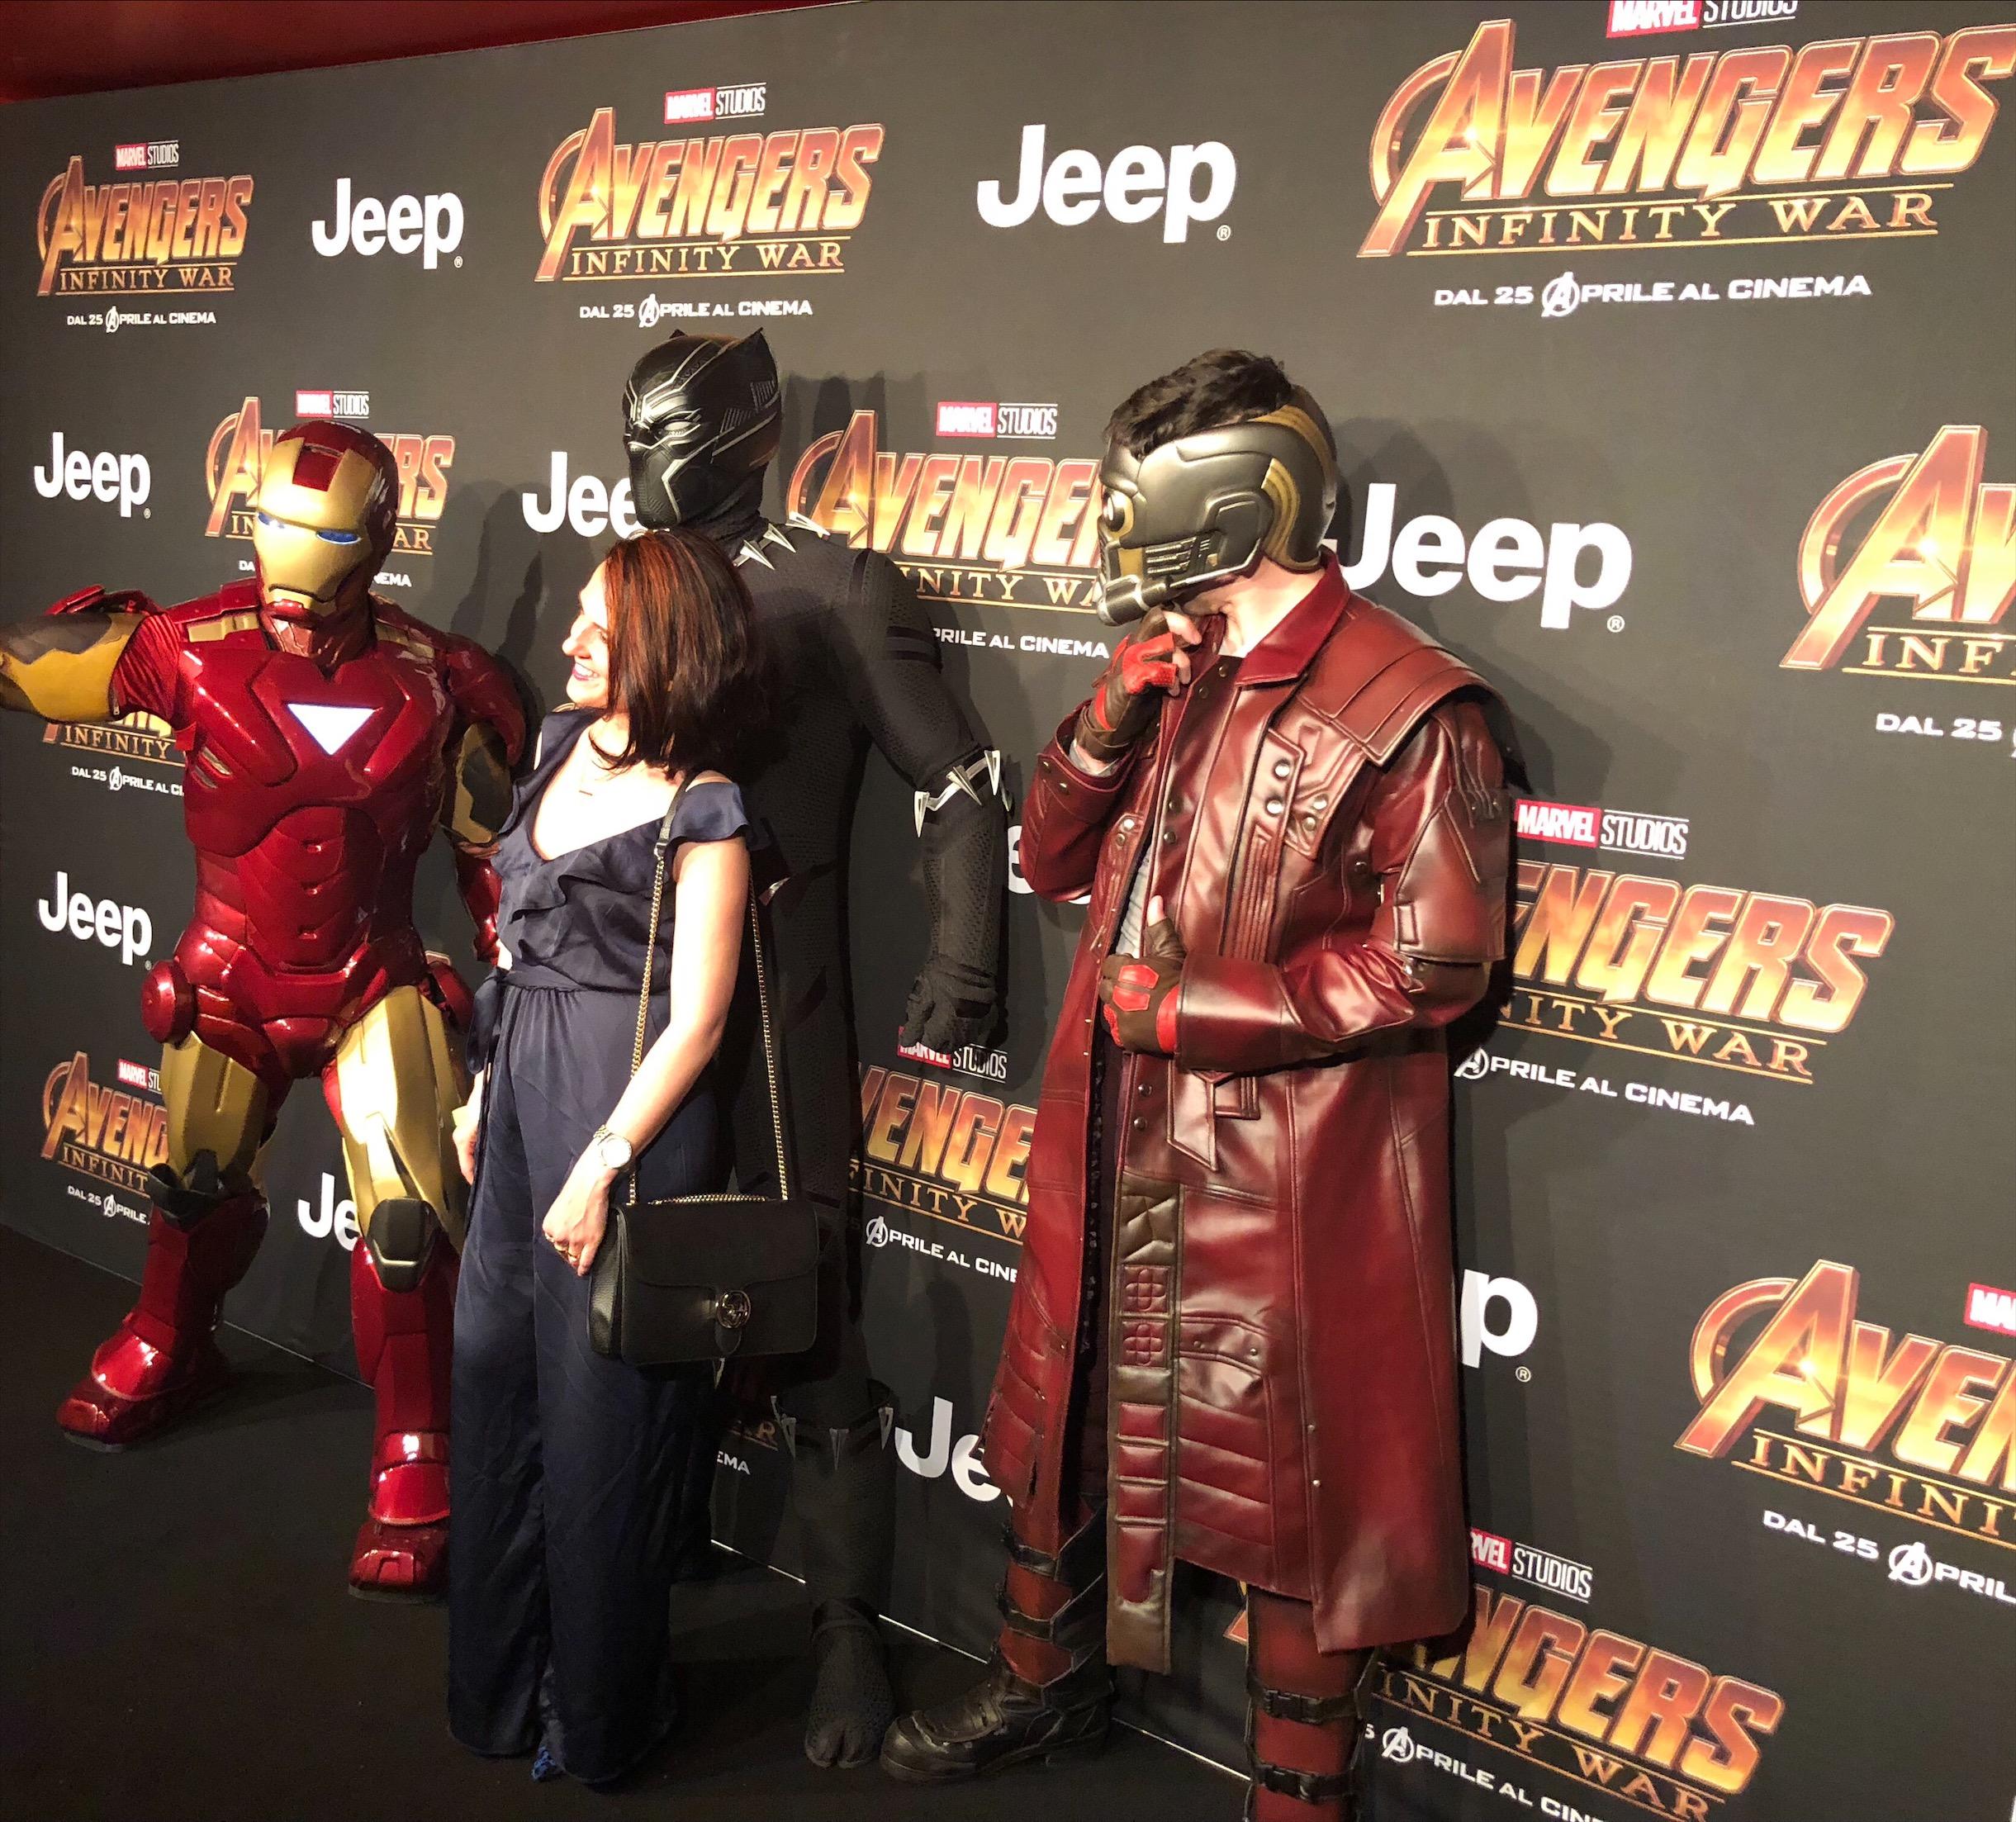 Avengers Infinity War in anteprima a Milano con Lego!